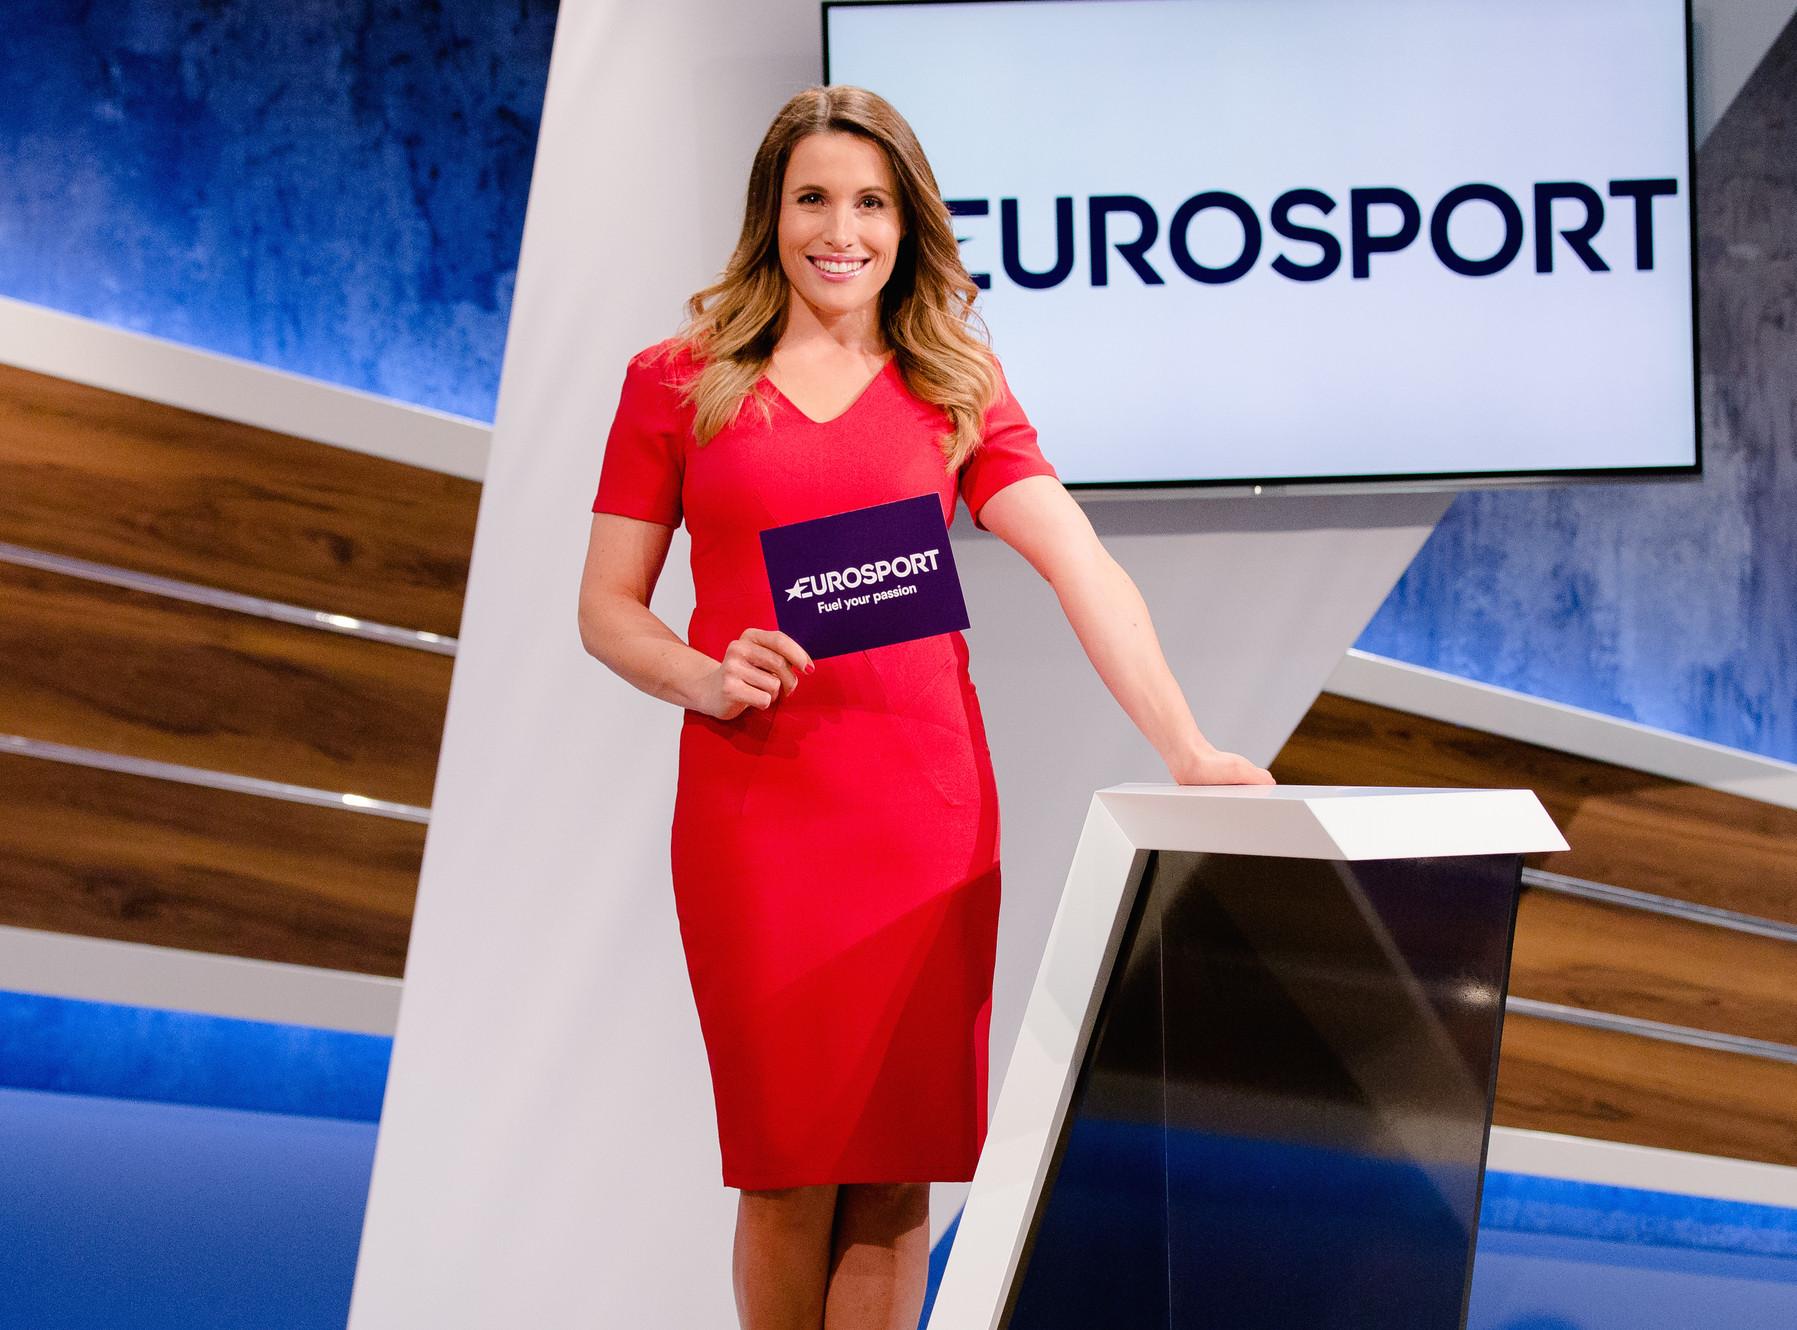 Eurosport Moderatorin